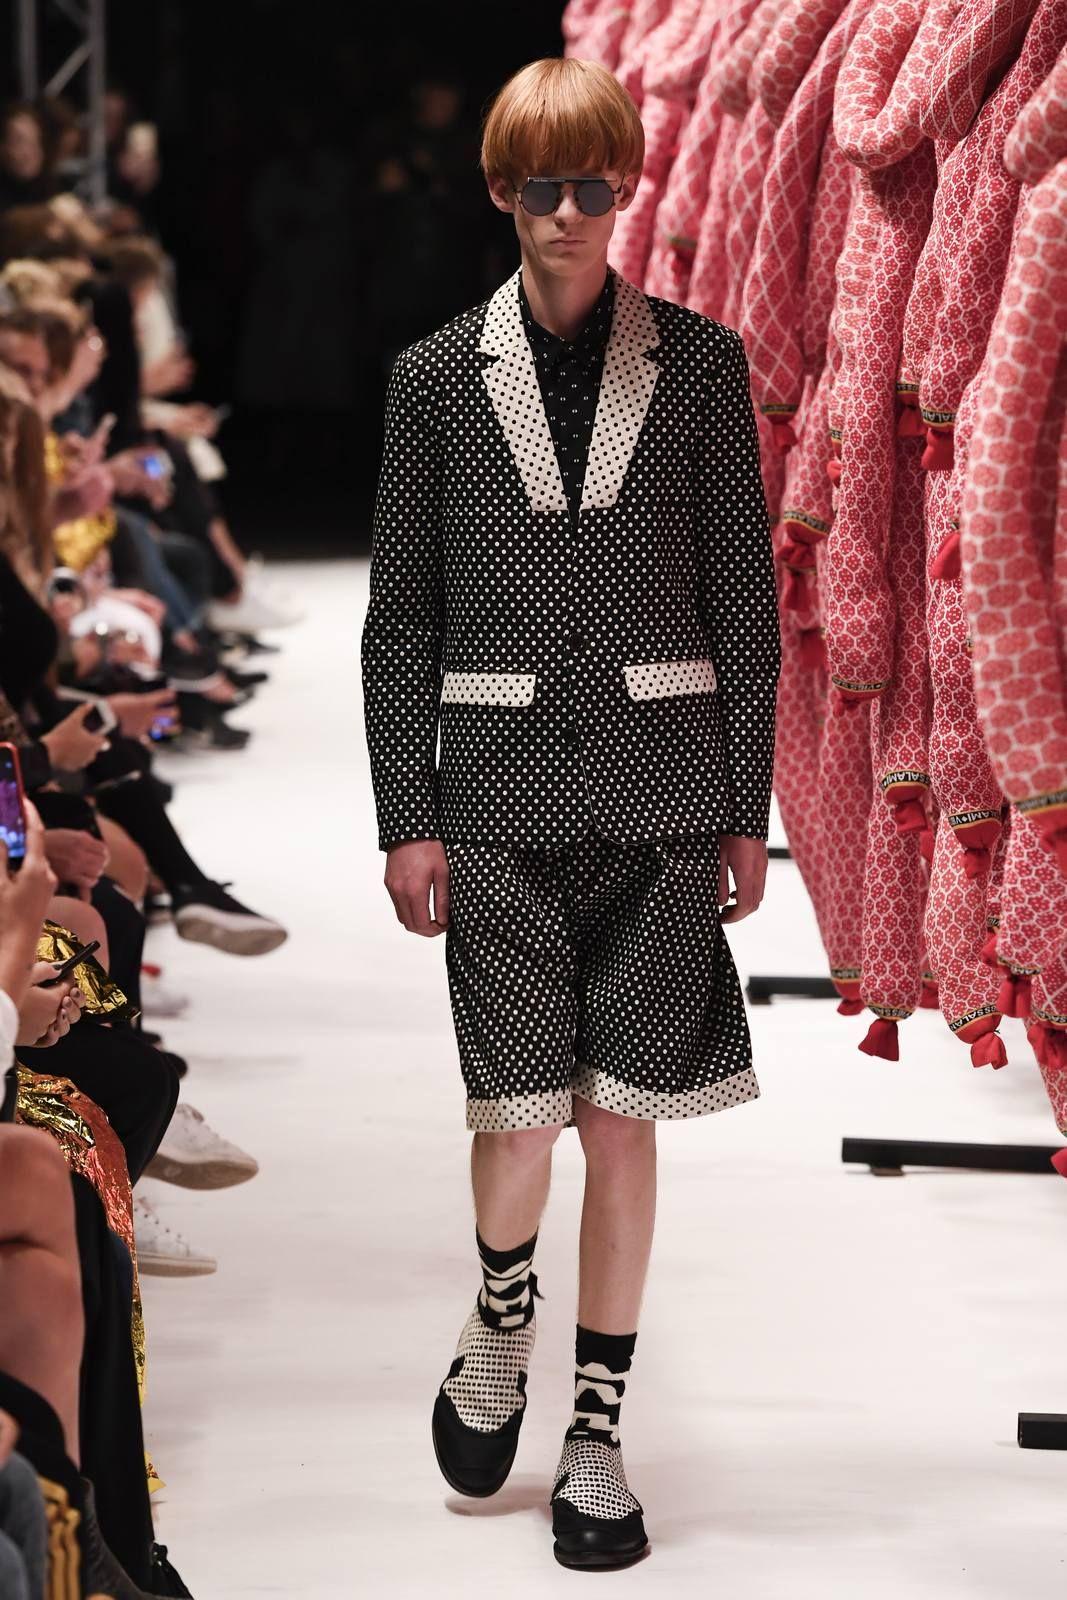 Henrik Vibskov Spring-Summer 2017 - Copenhagen Fashion Week #CPHFW